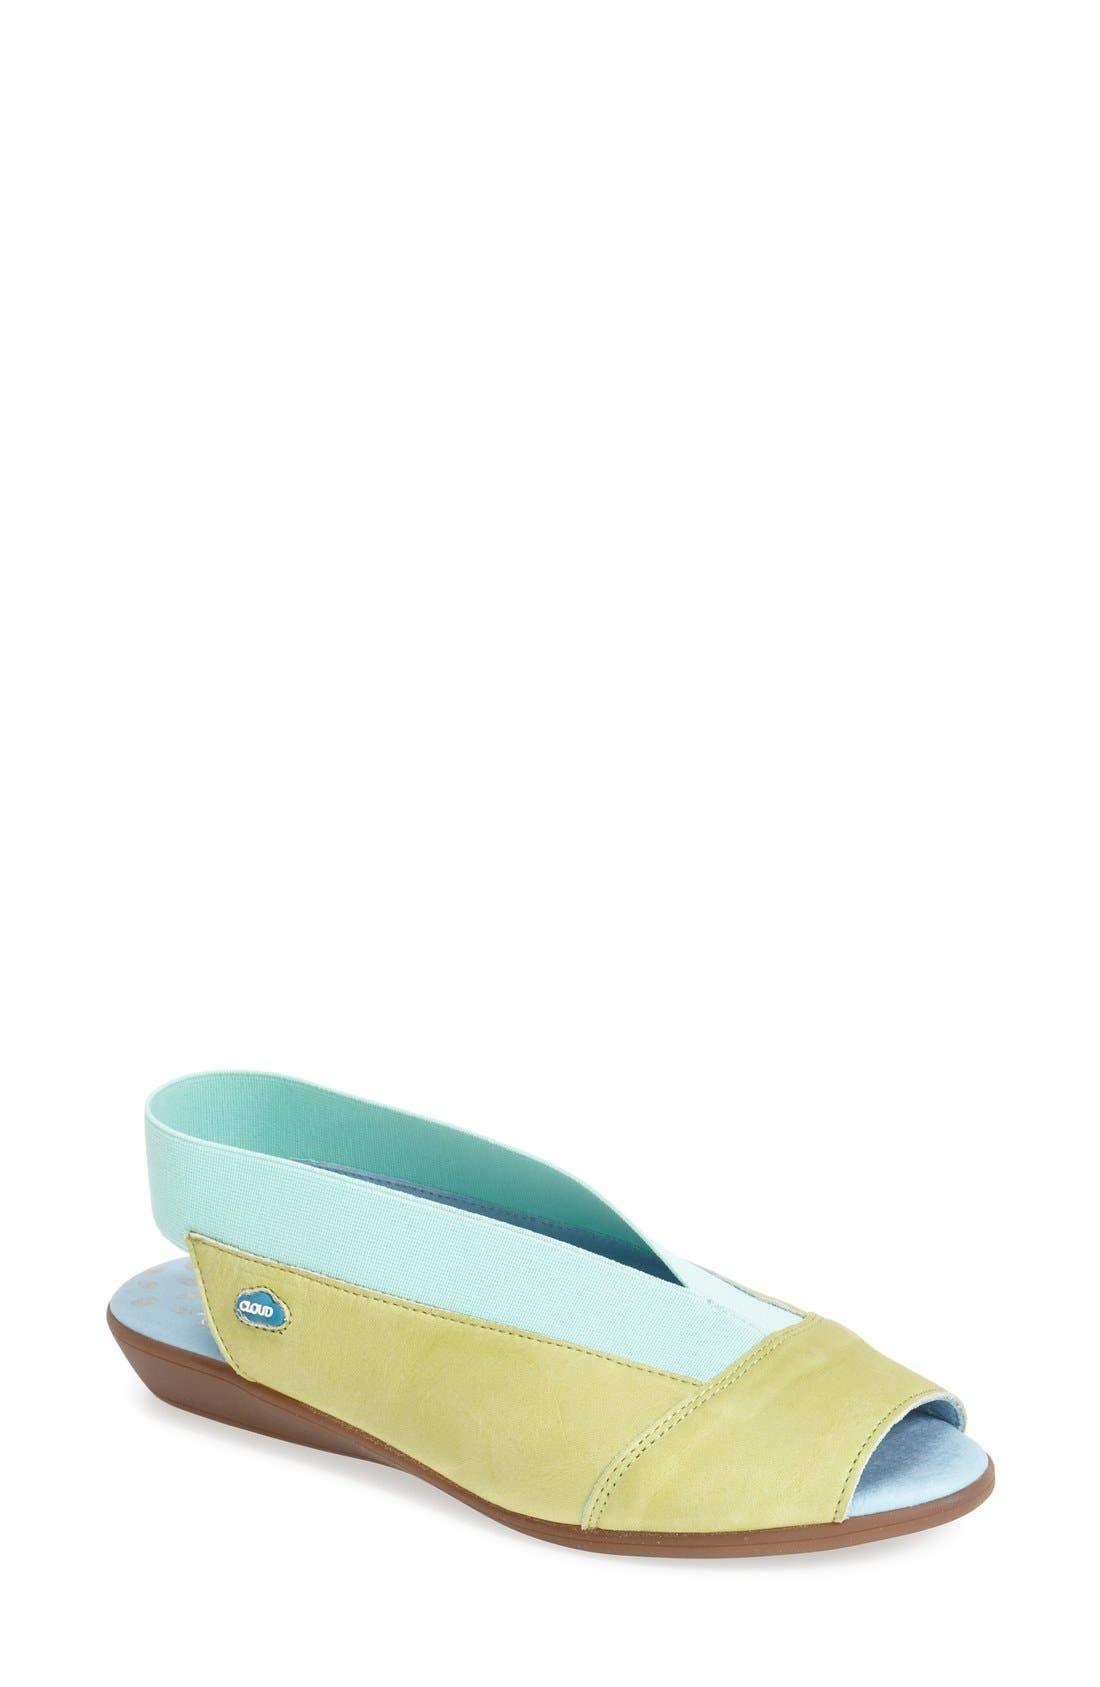 Main Image - CLOUD 'Caliber' Peep Toe Leather Flat (Women)